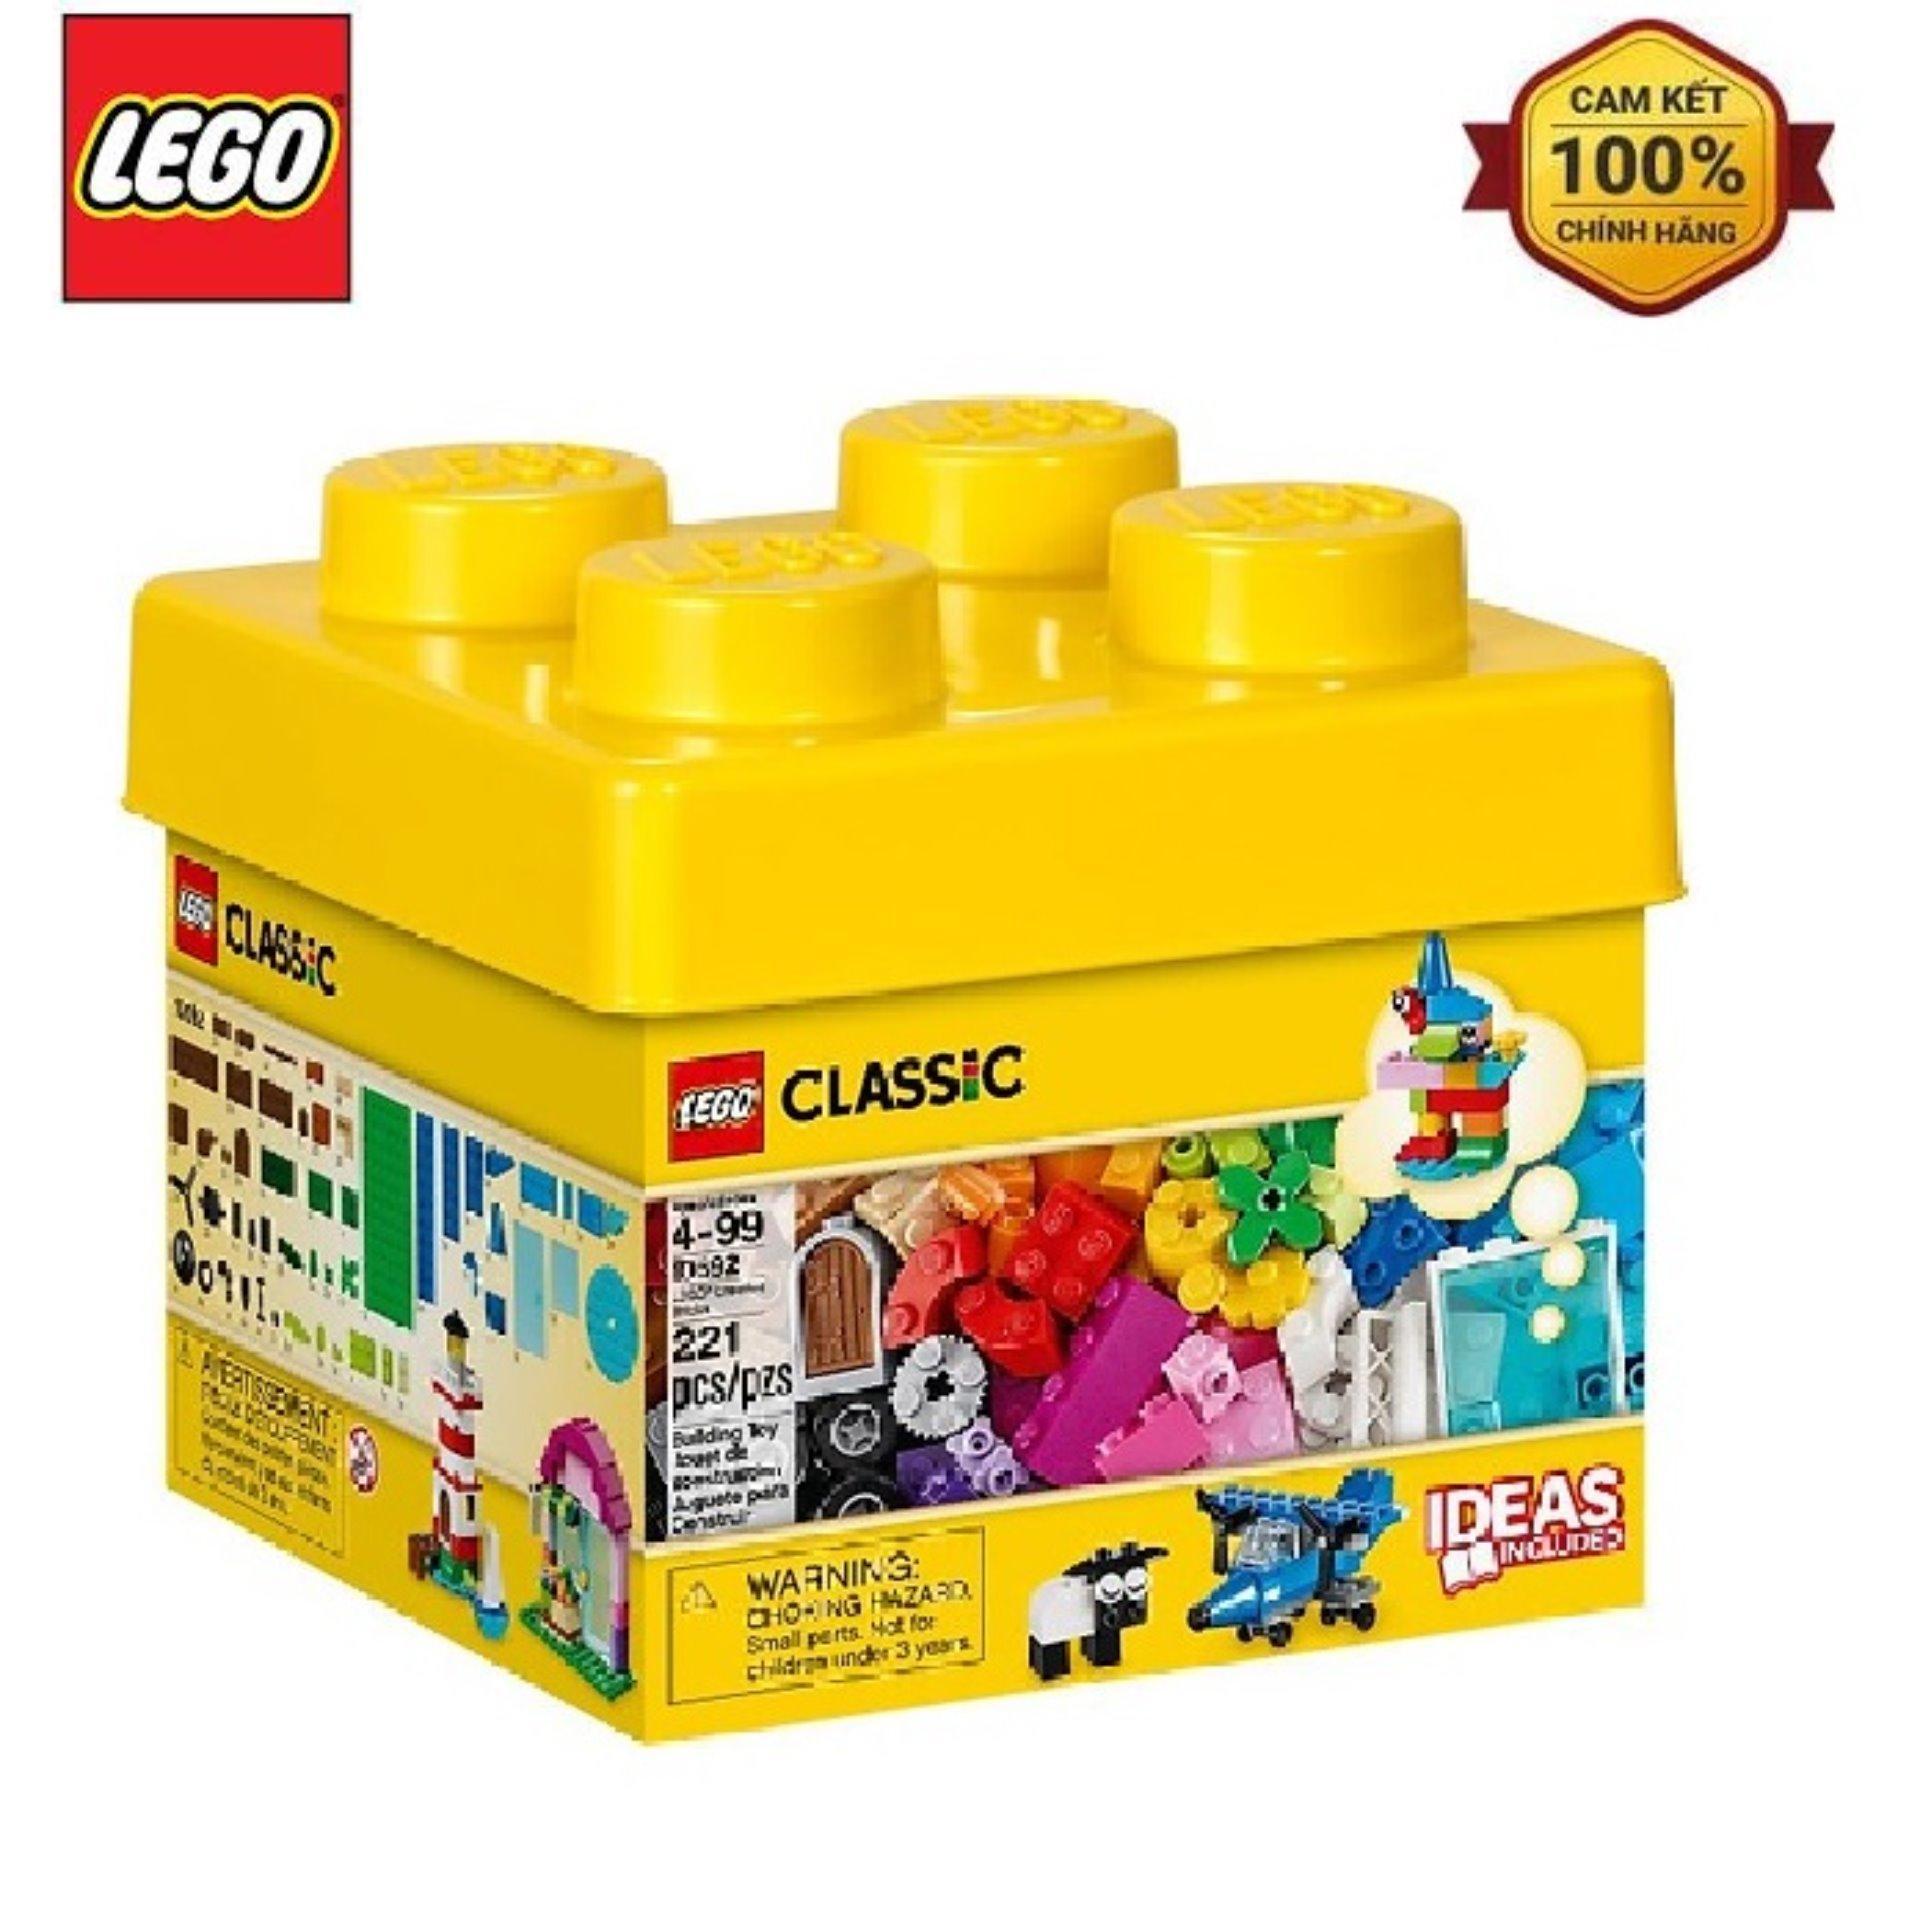 Hộp LEGO Classic sáng tạo 10692 - 221 miếng ghép